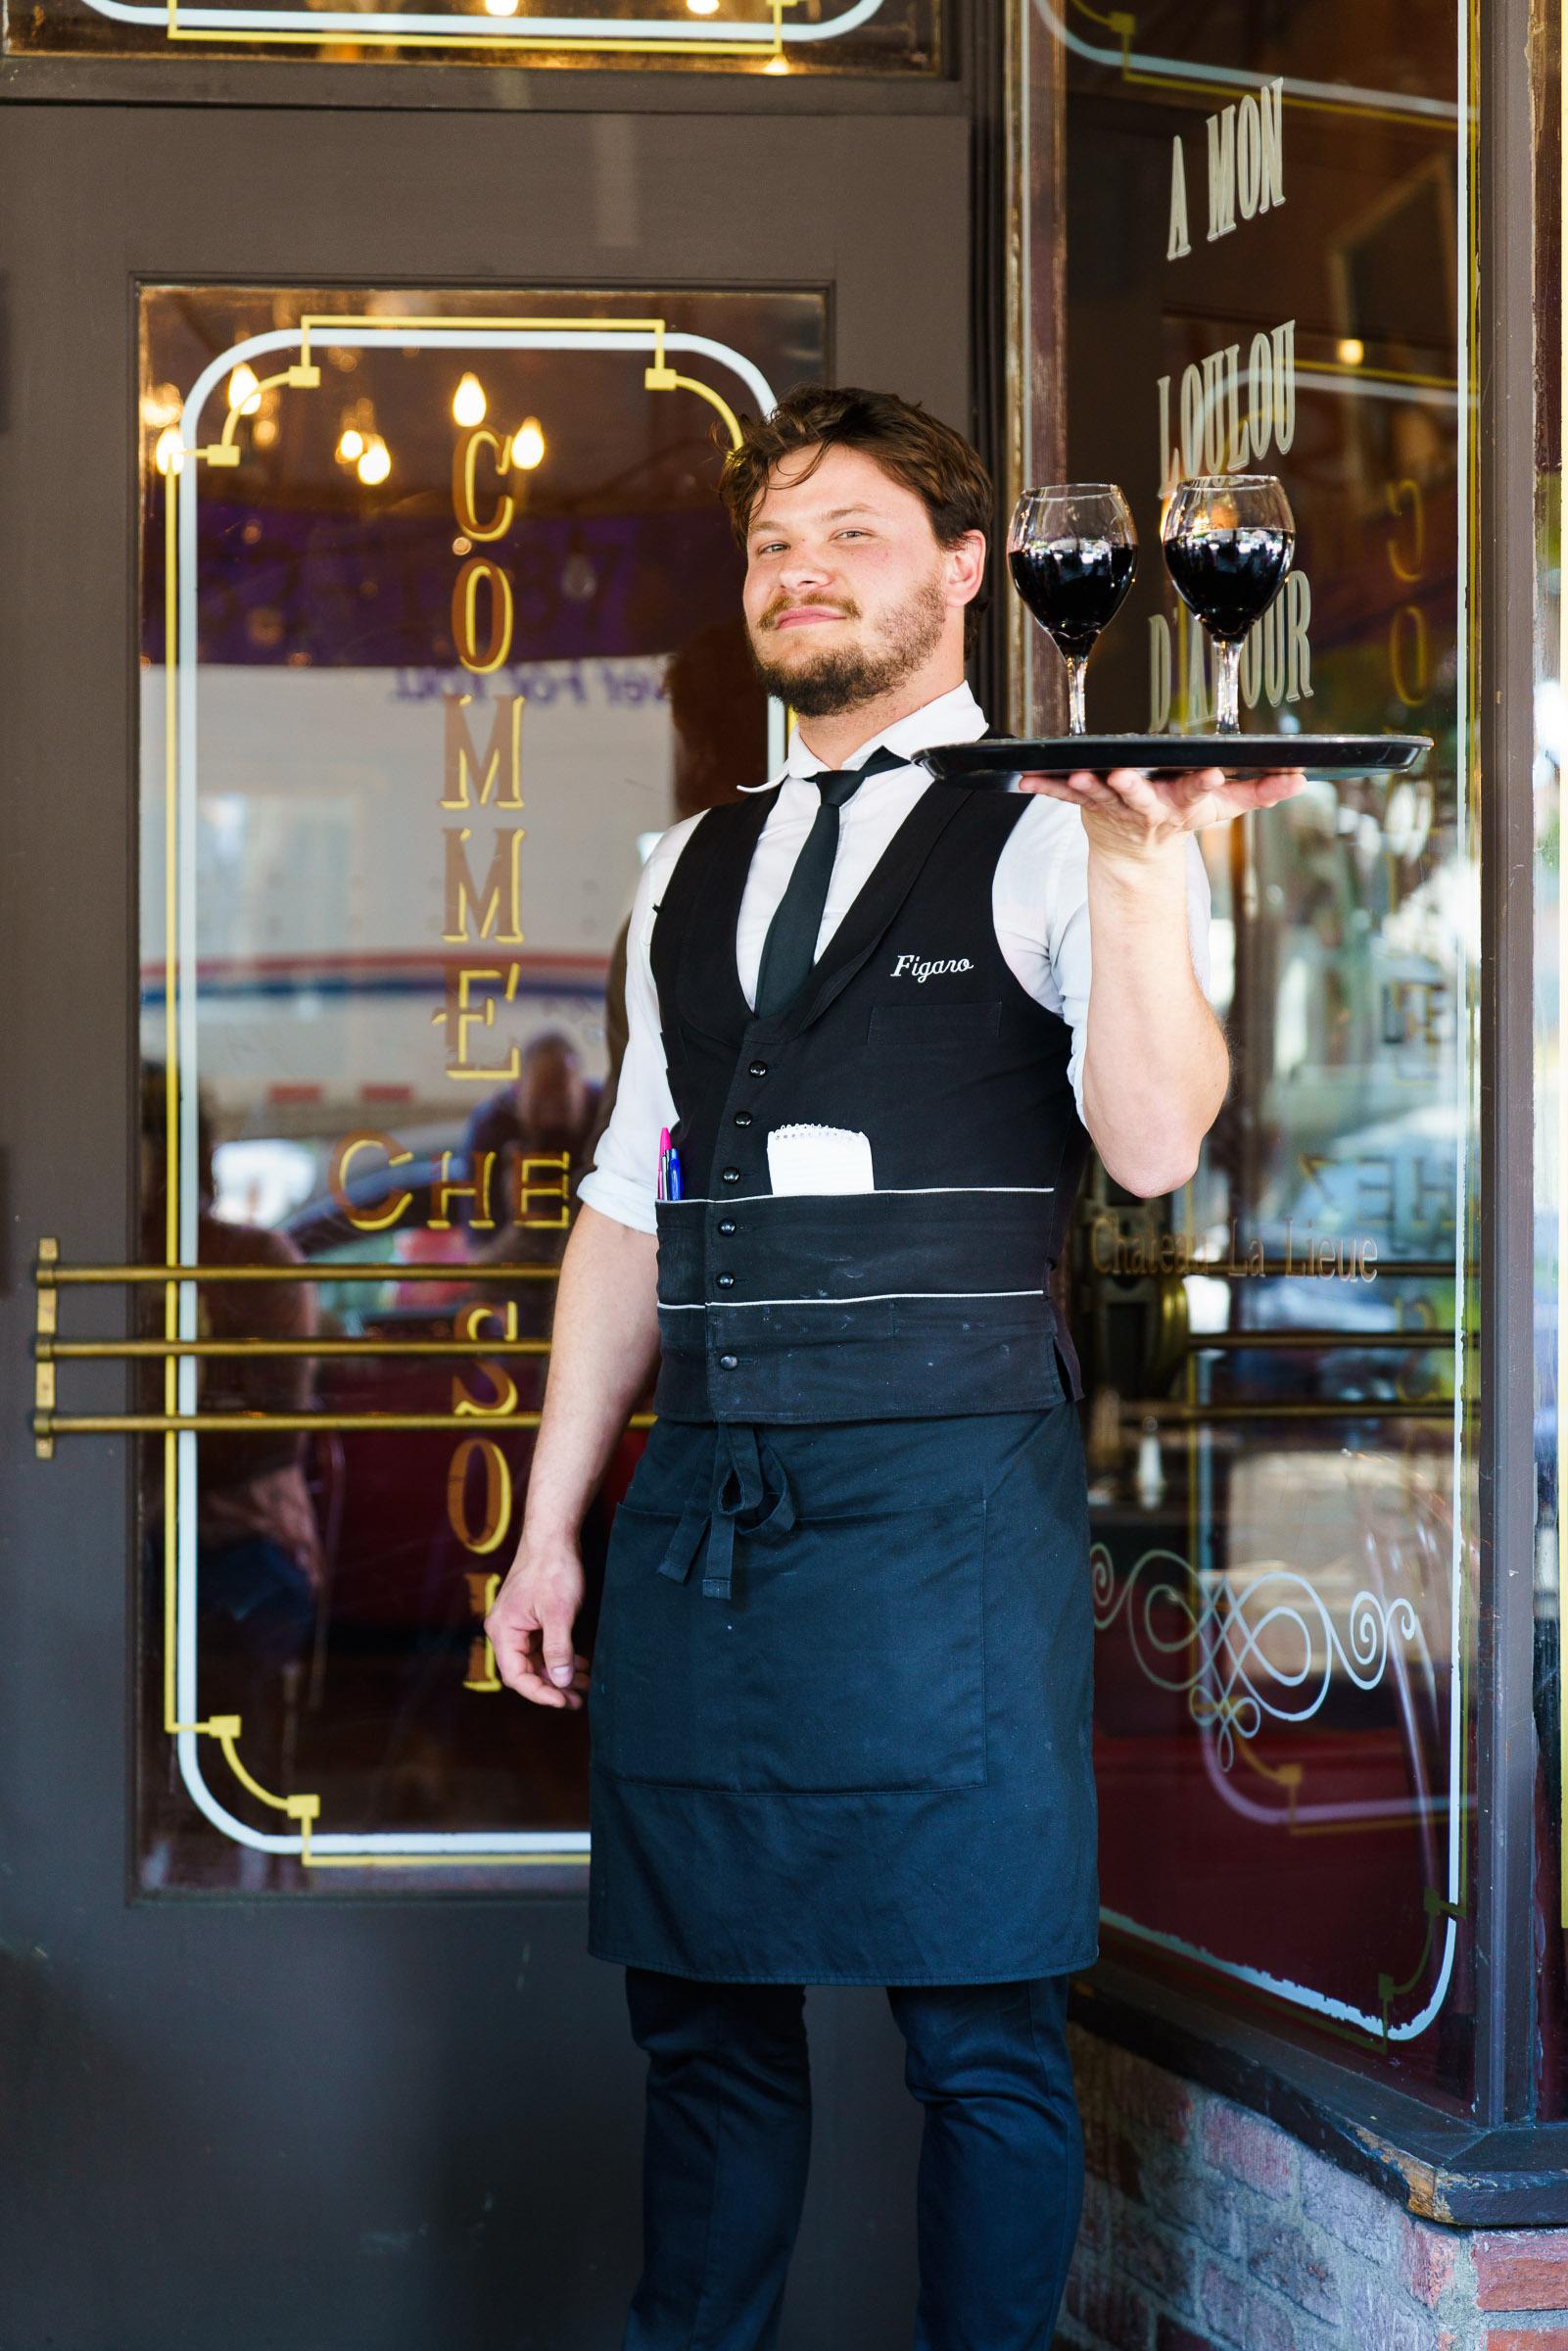 Boris Macquiw | Waiter -